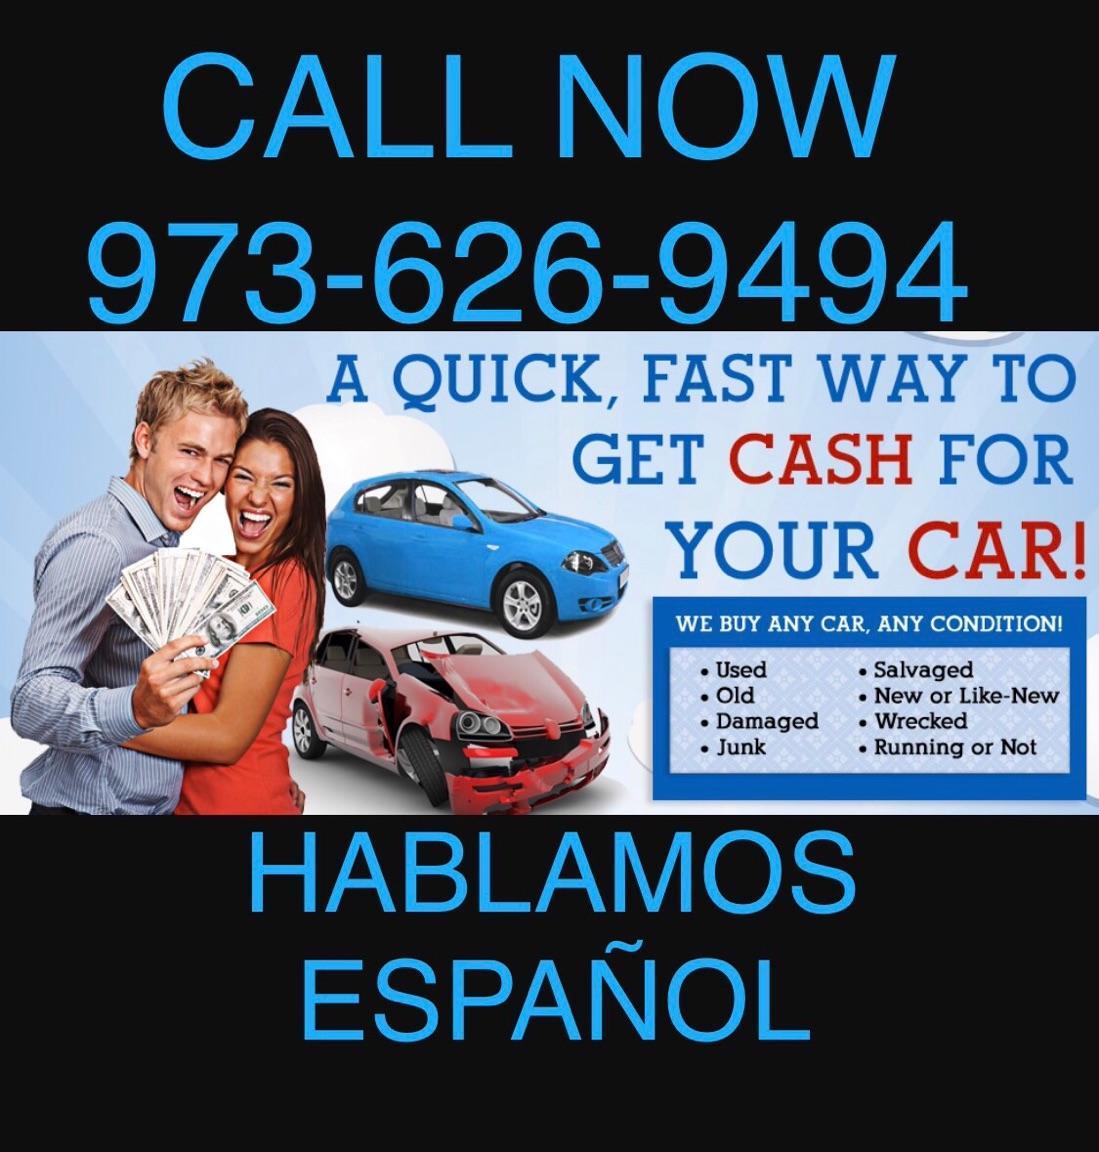 Cash For Junk Cars NJ in Newark, NJ 07104 - ChamberofCommerce.com